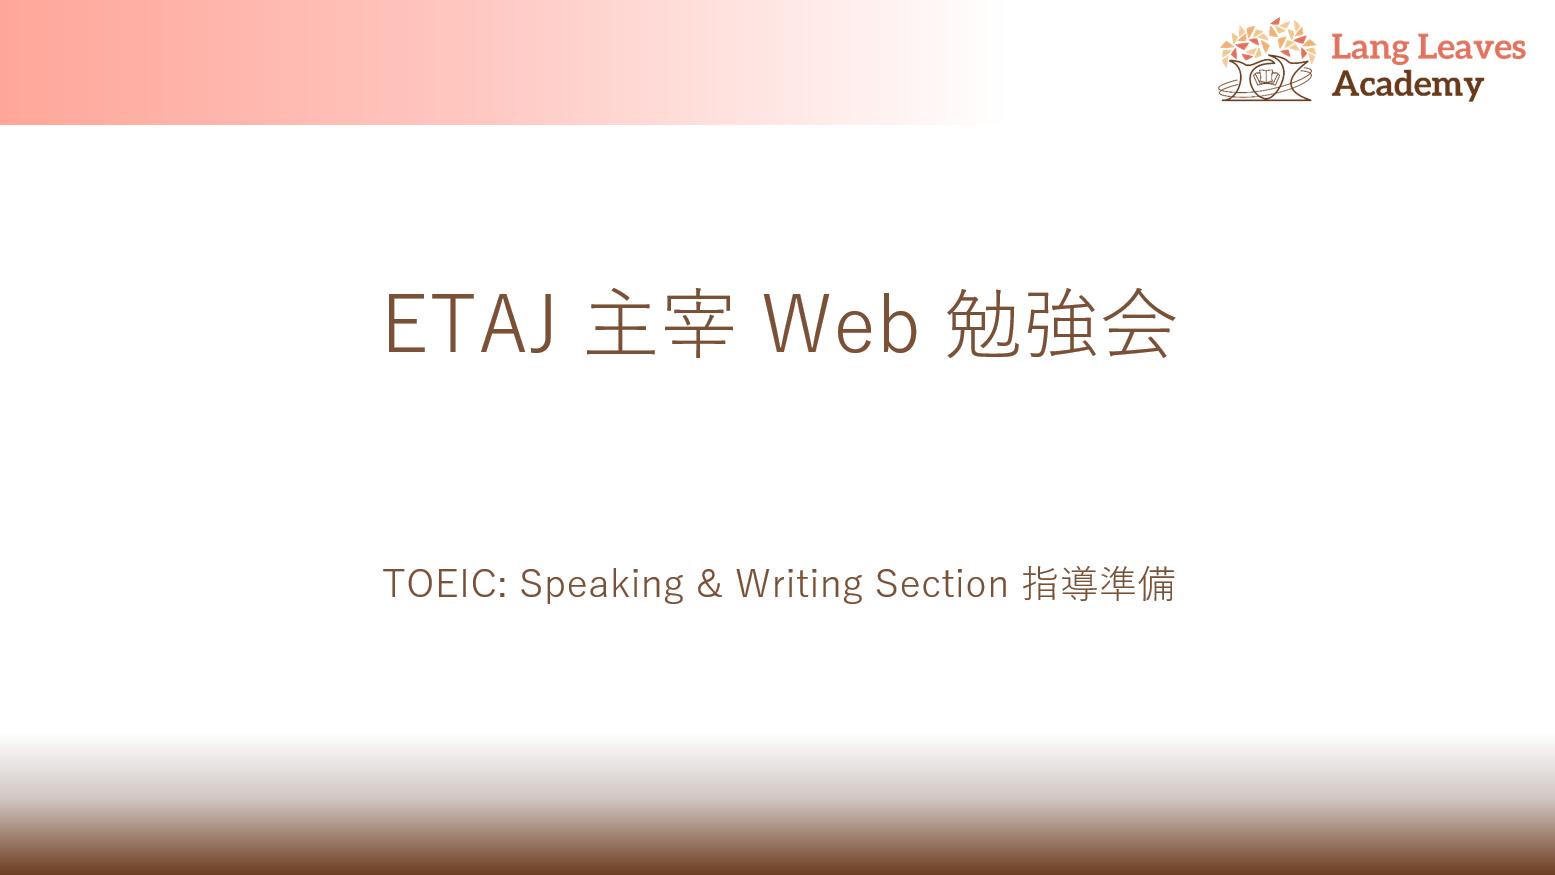 Protected: TOEIC Speaking & Writing Section 指導準備:セッションメモ